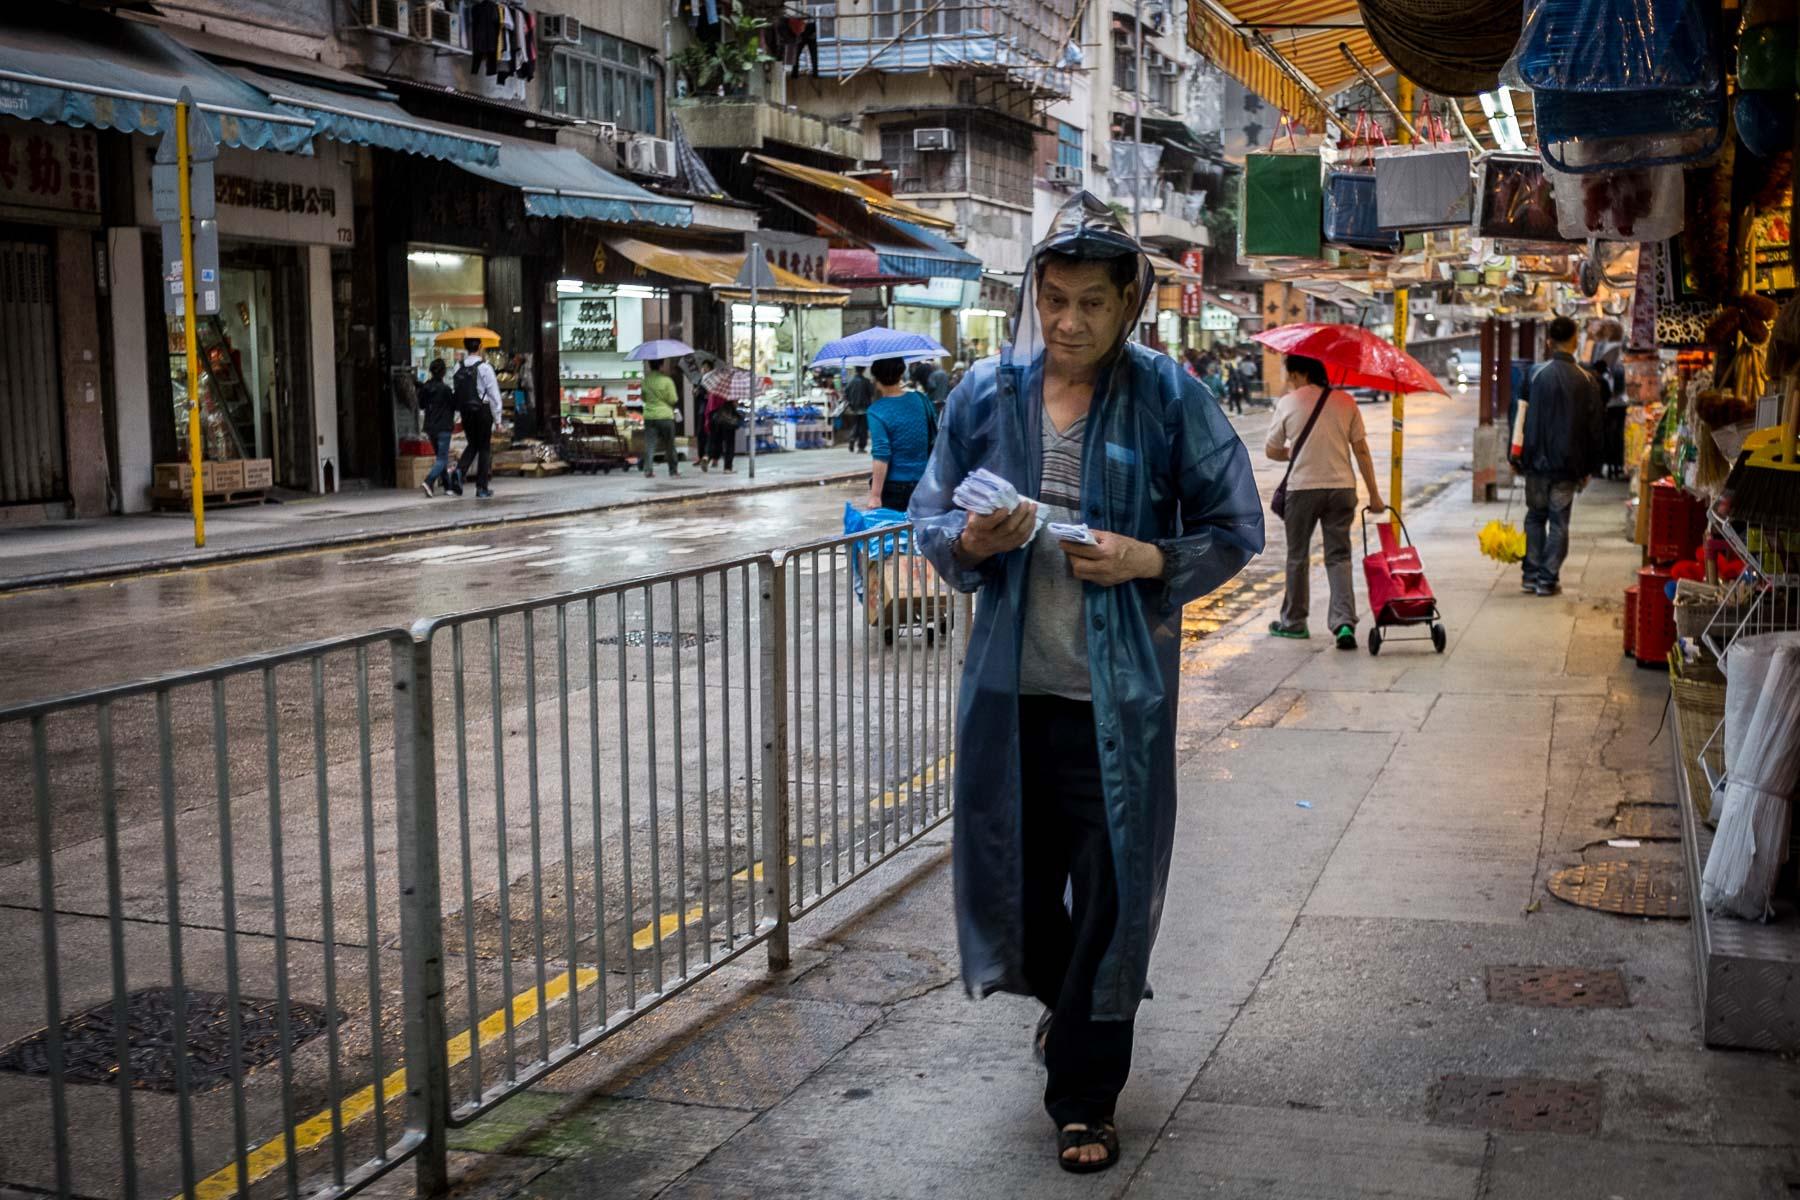 HK 2016 (10 of 66)